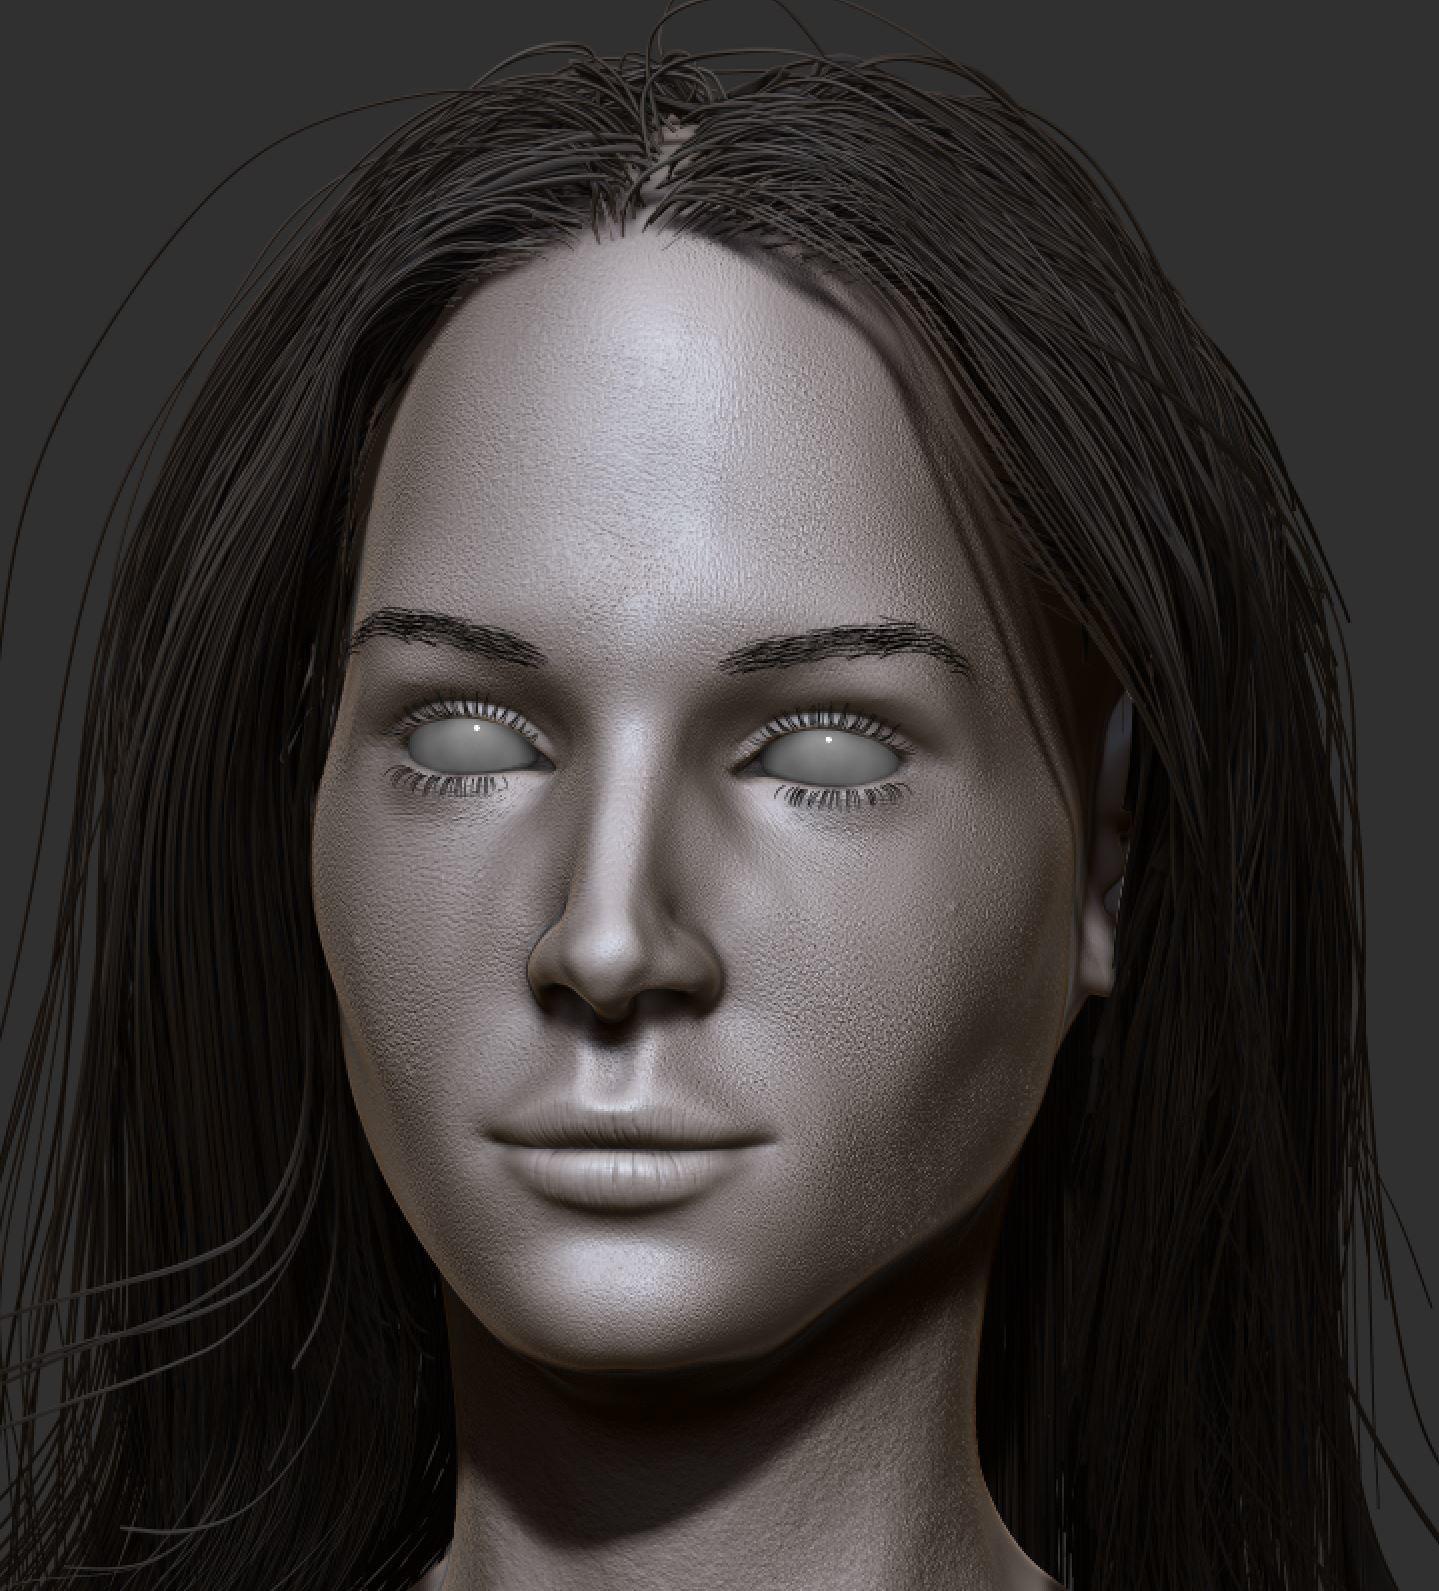 Michael Masuda - female portrait study